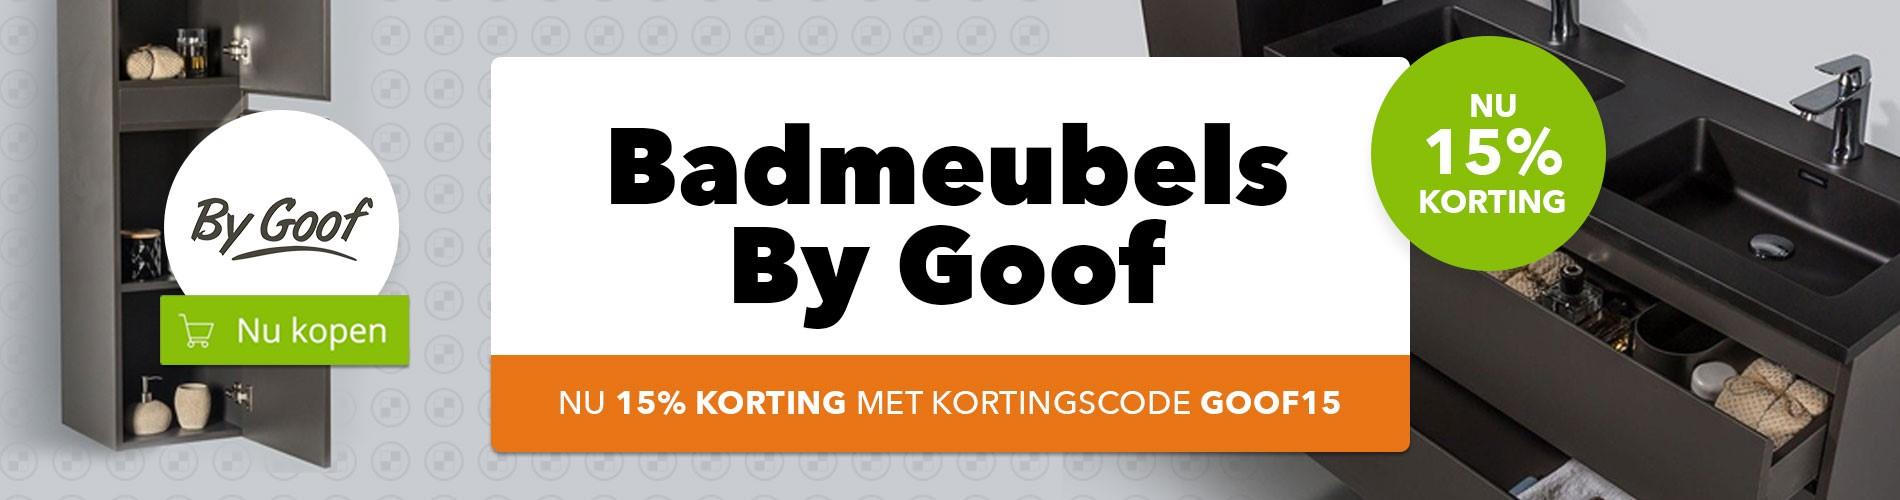 By Goof Badmeubels